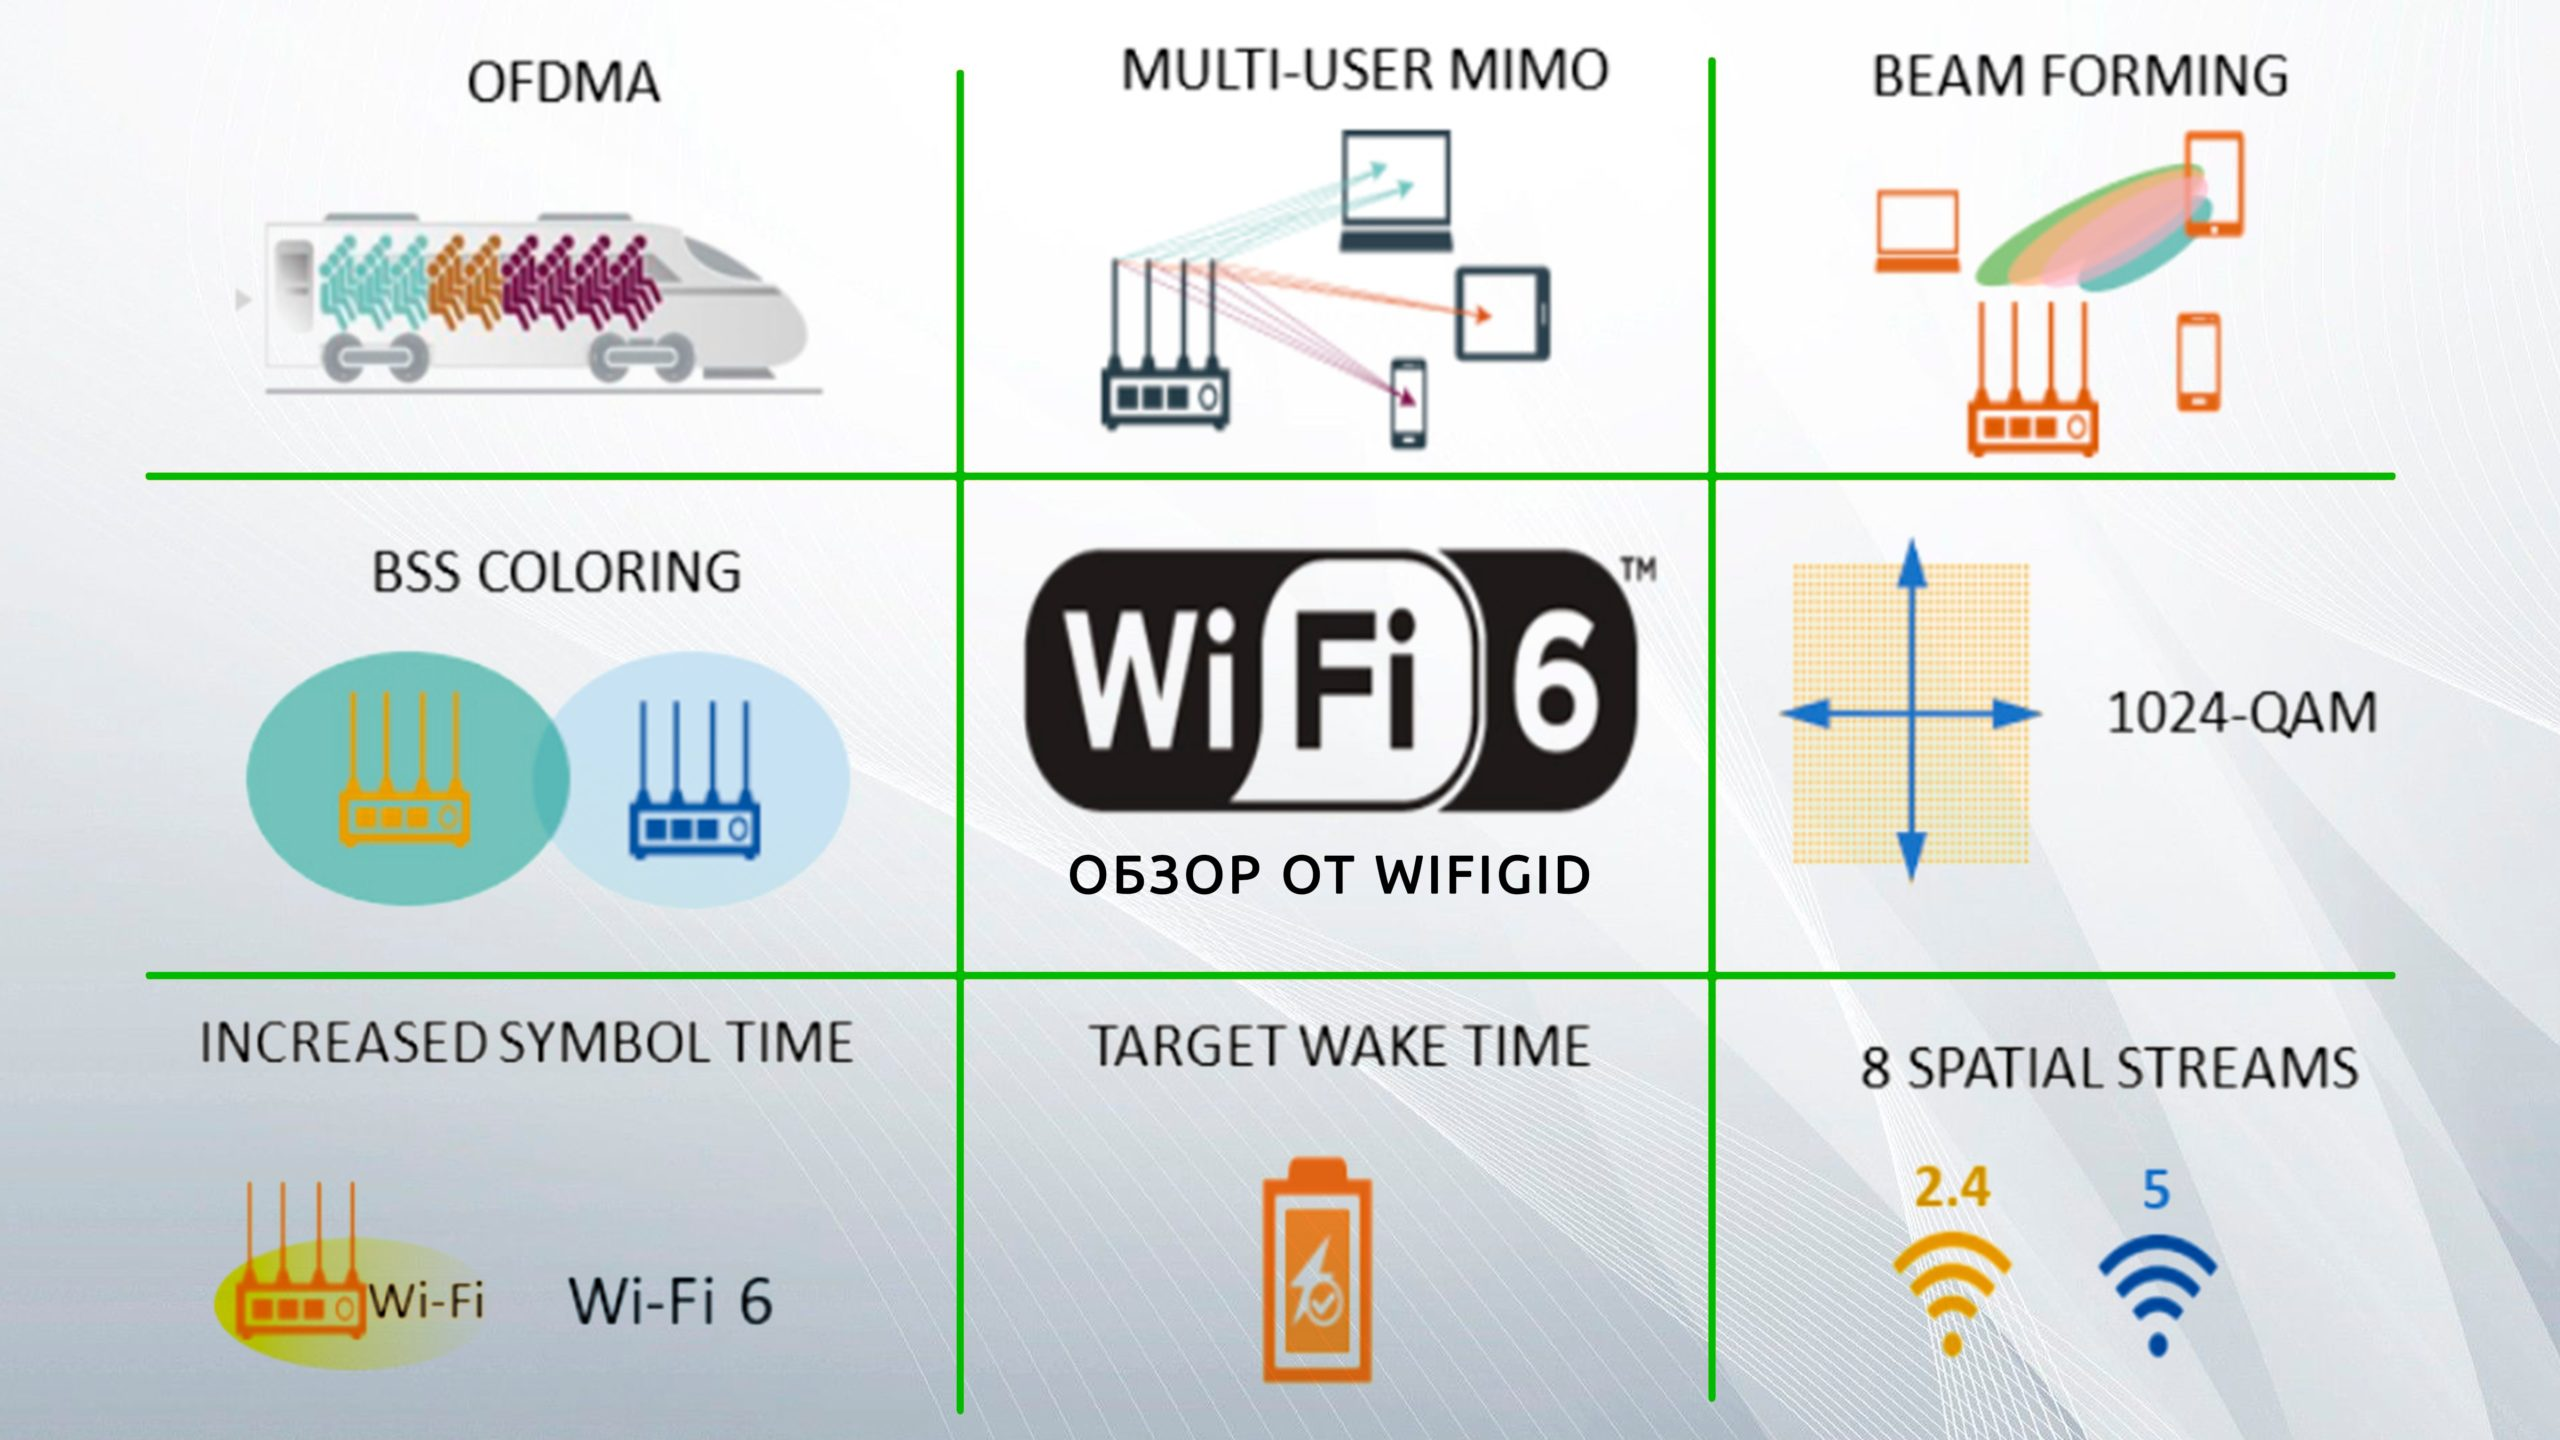 Новое в Wi-Fi 6: OFDMA, MU-MIMO, Beam Forming, BSS Coloring, 1024-QAM, Increased Symbol Time, Target Wake Time, 8 Spatial Streams